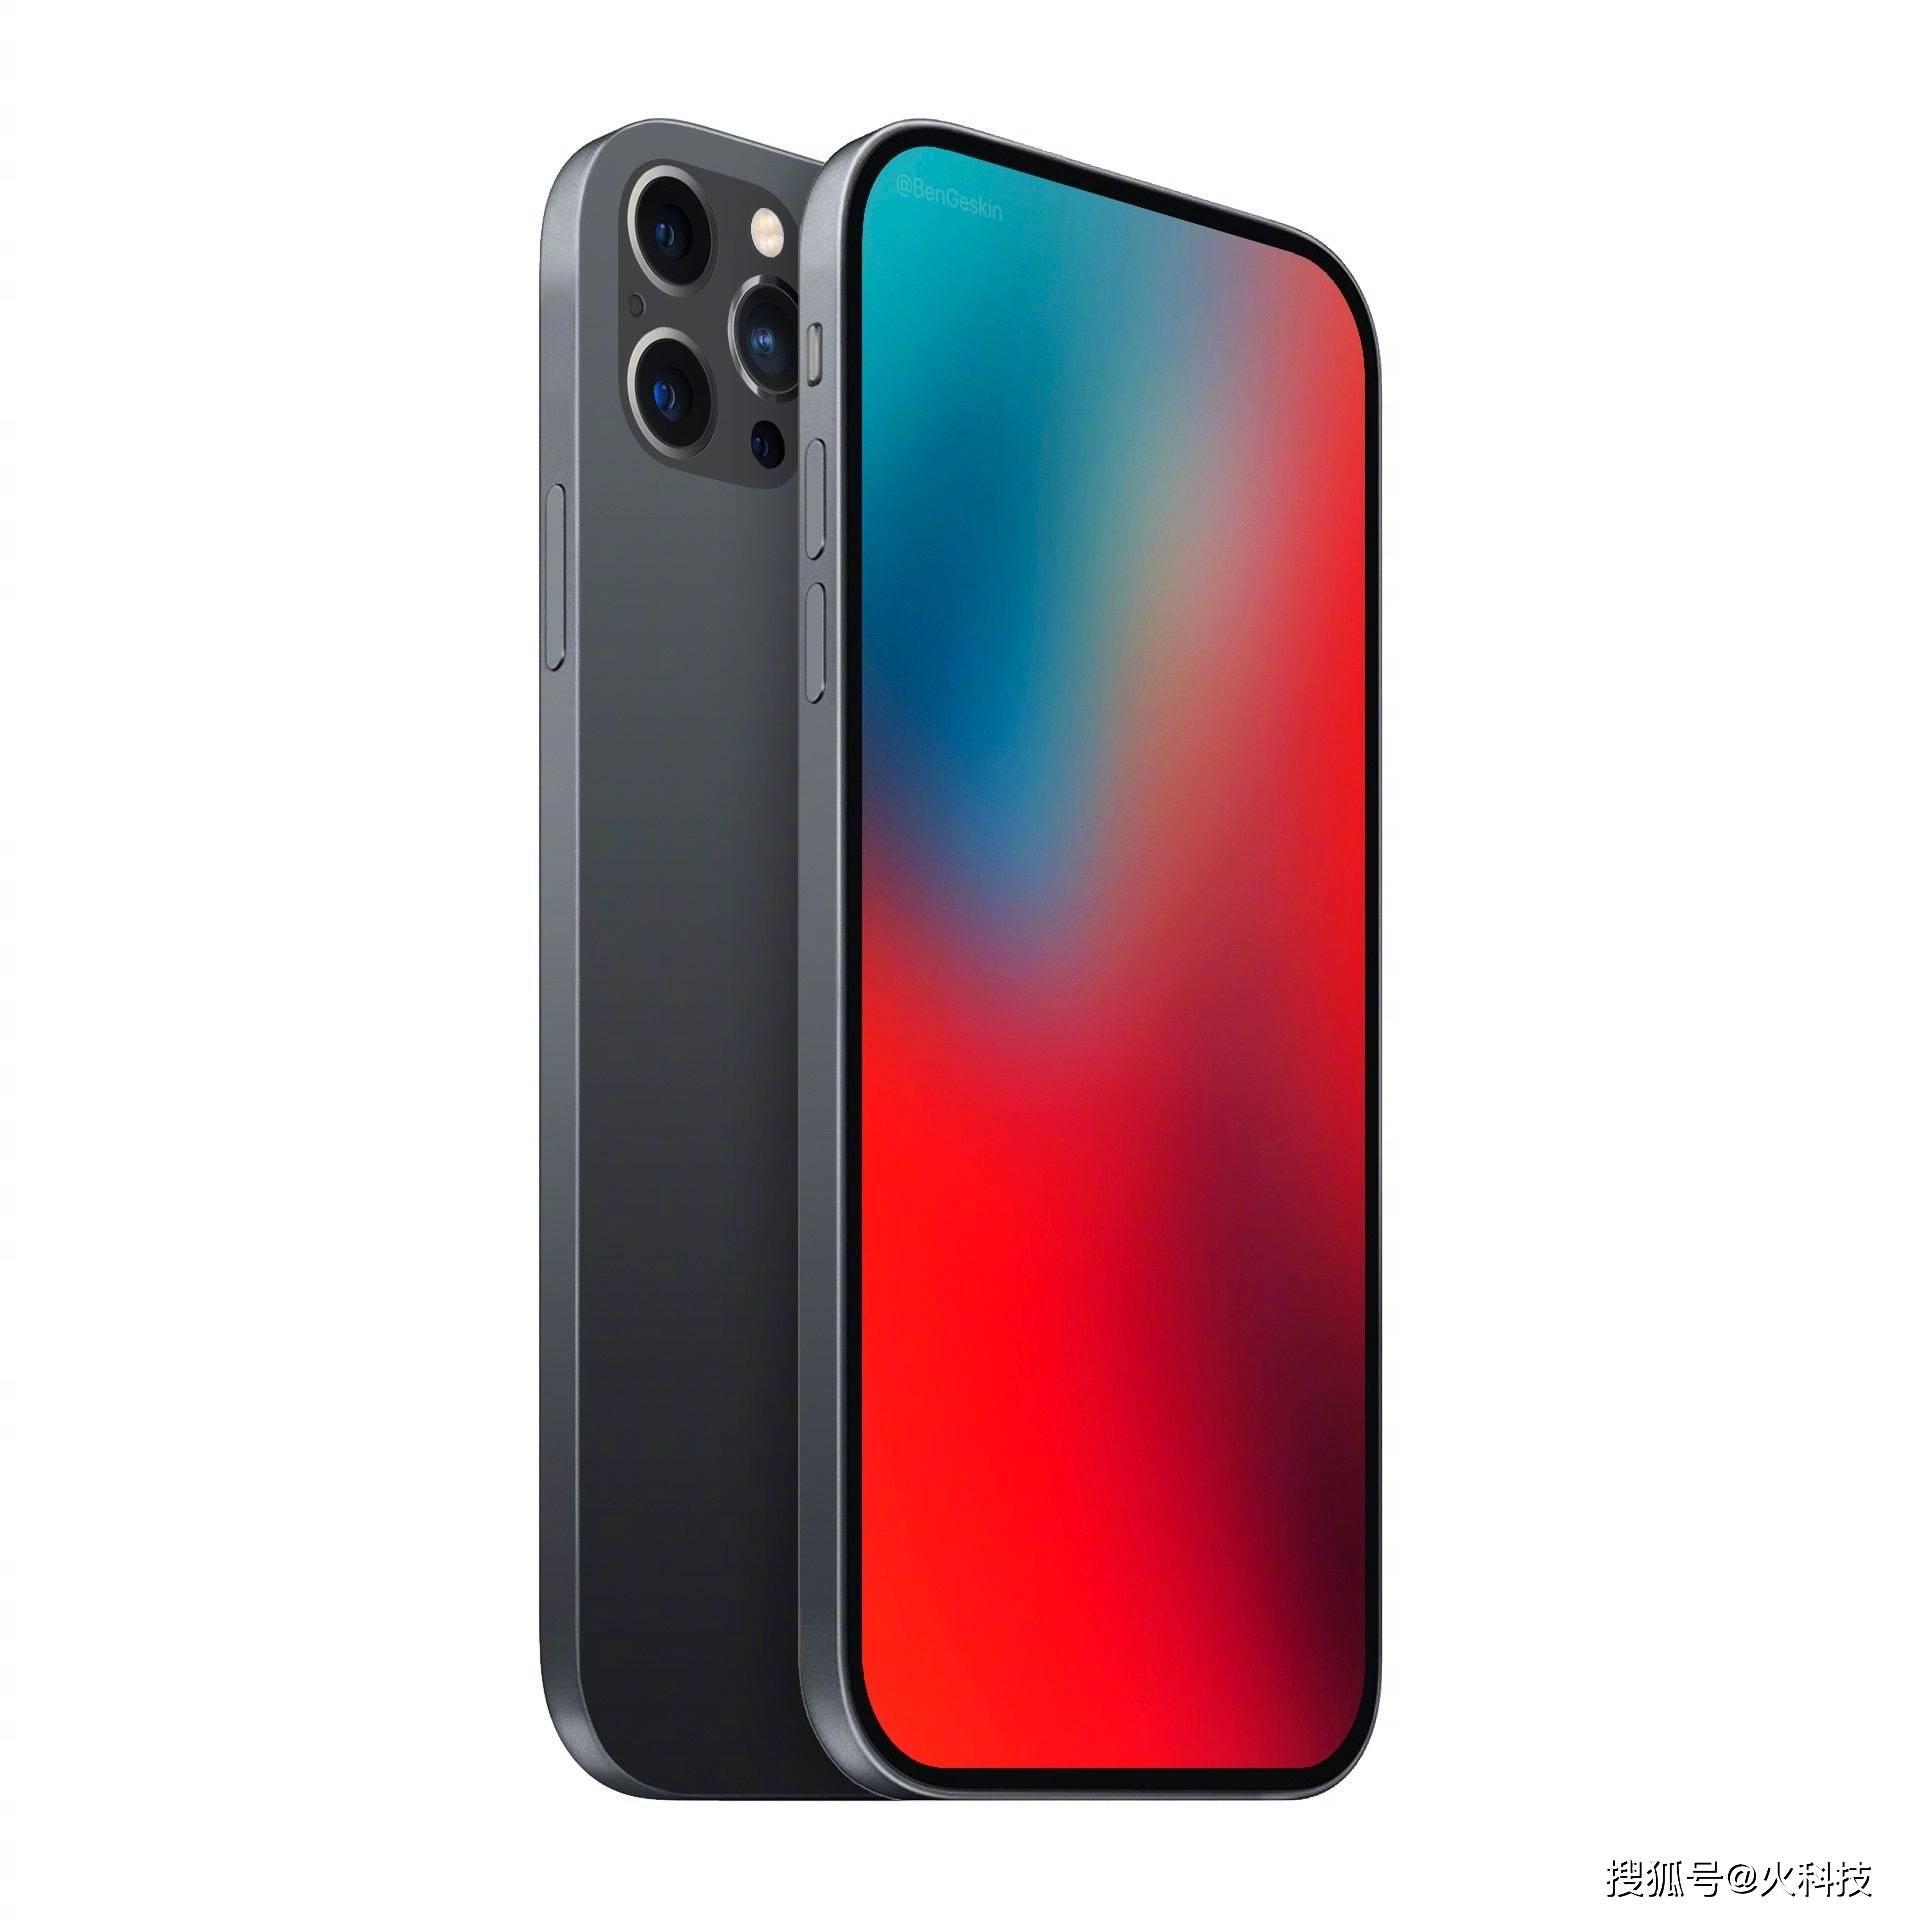 iPhone12即将到来,外观和配置已明确!你会继续买苹果手机吗?